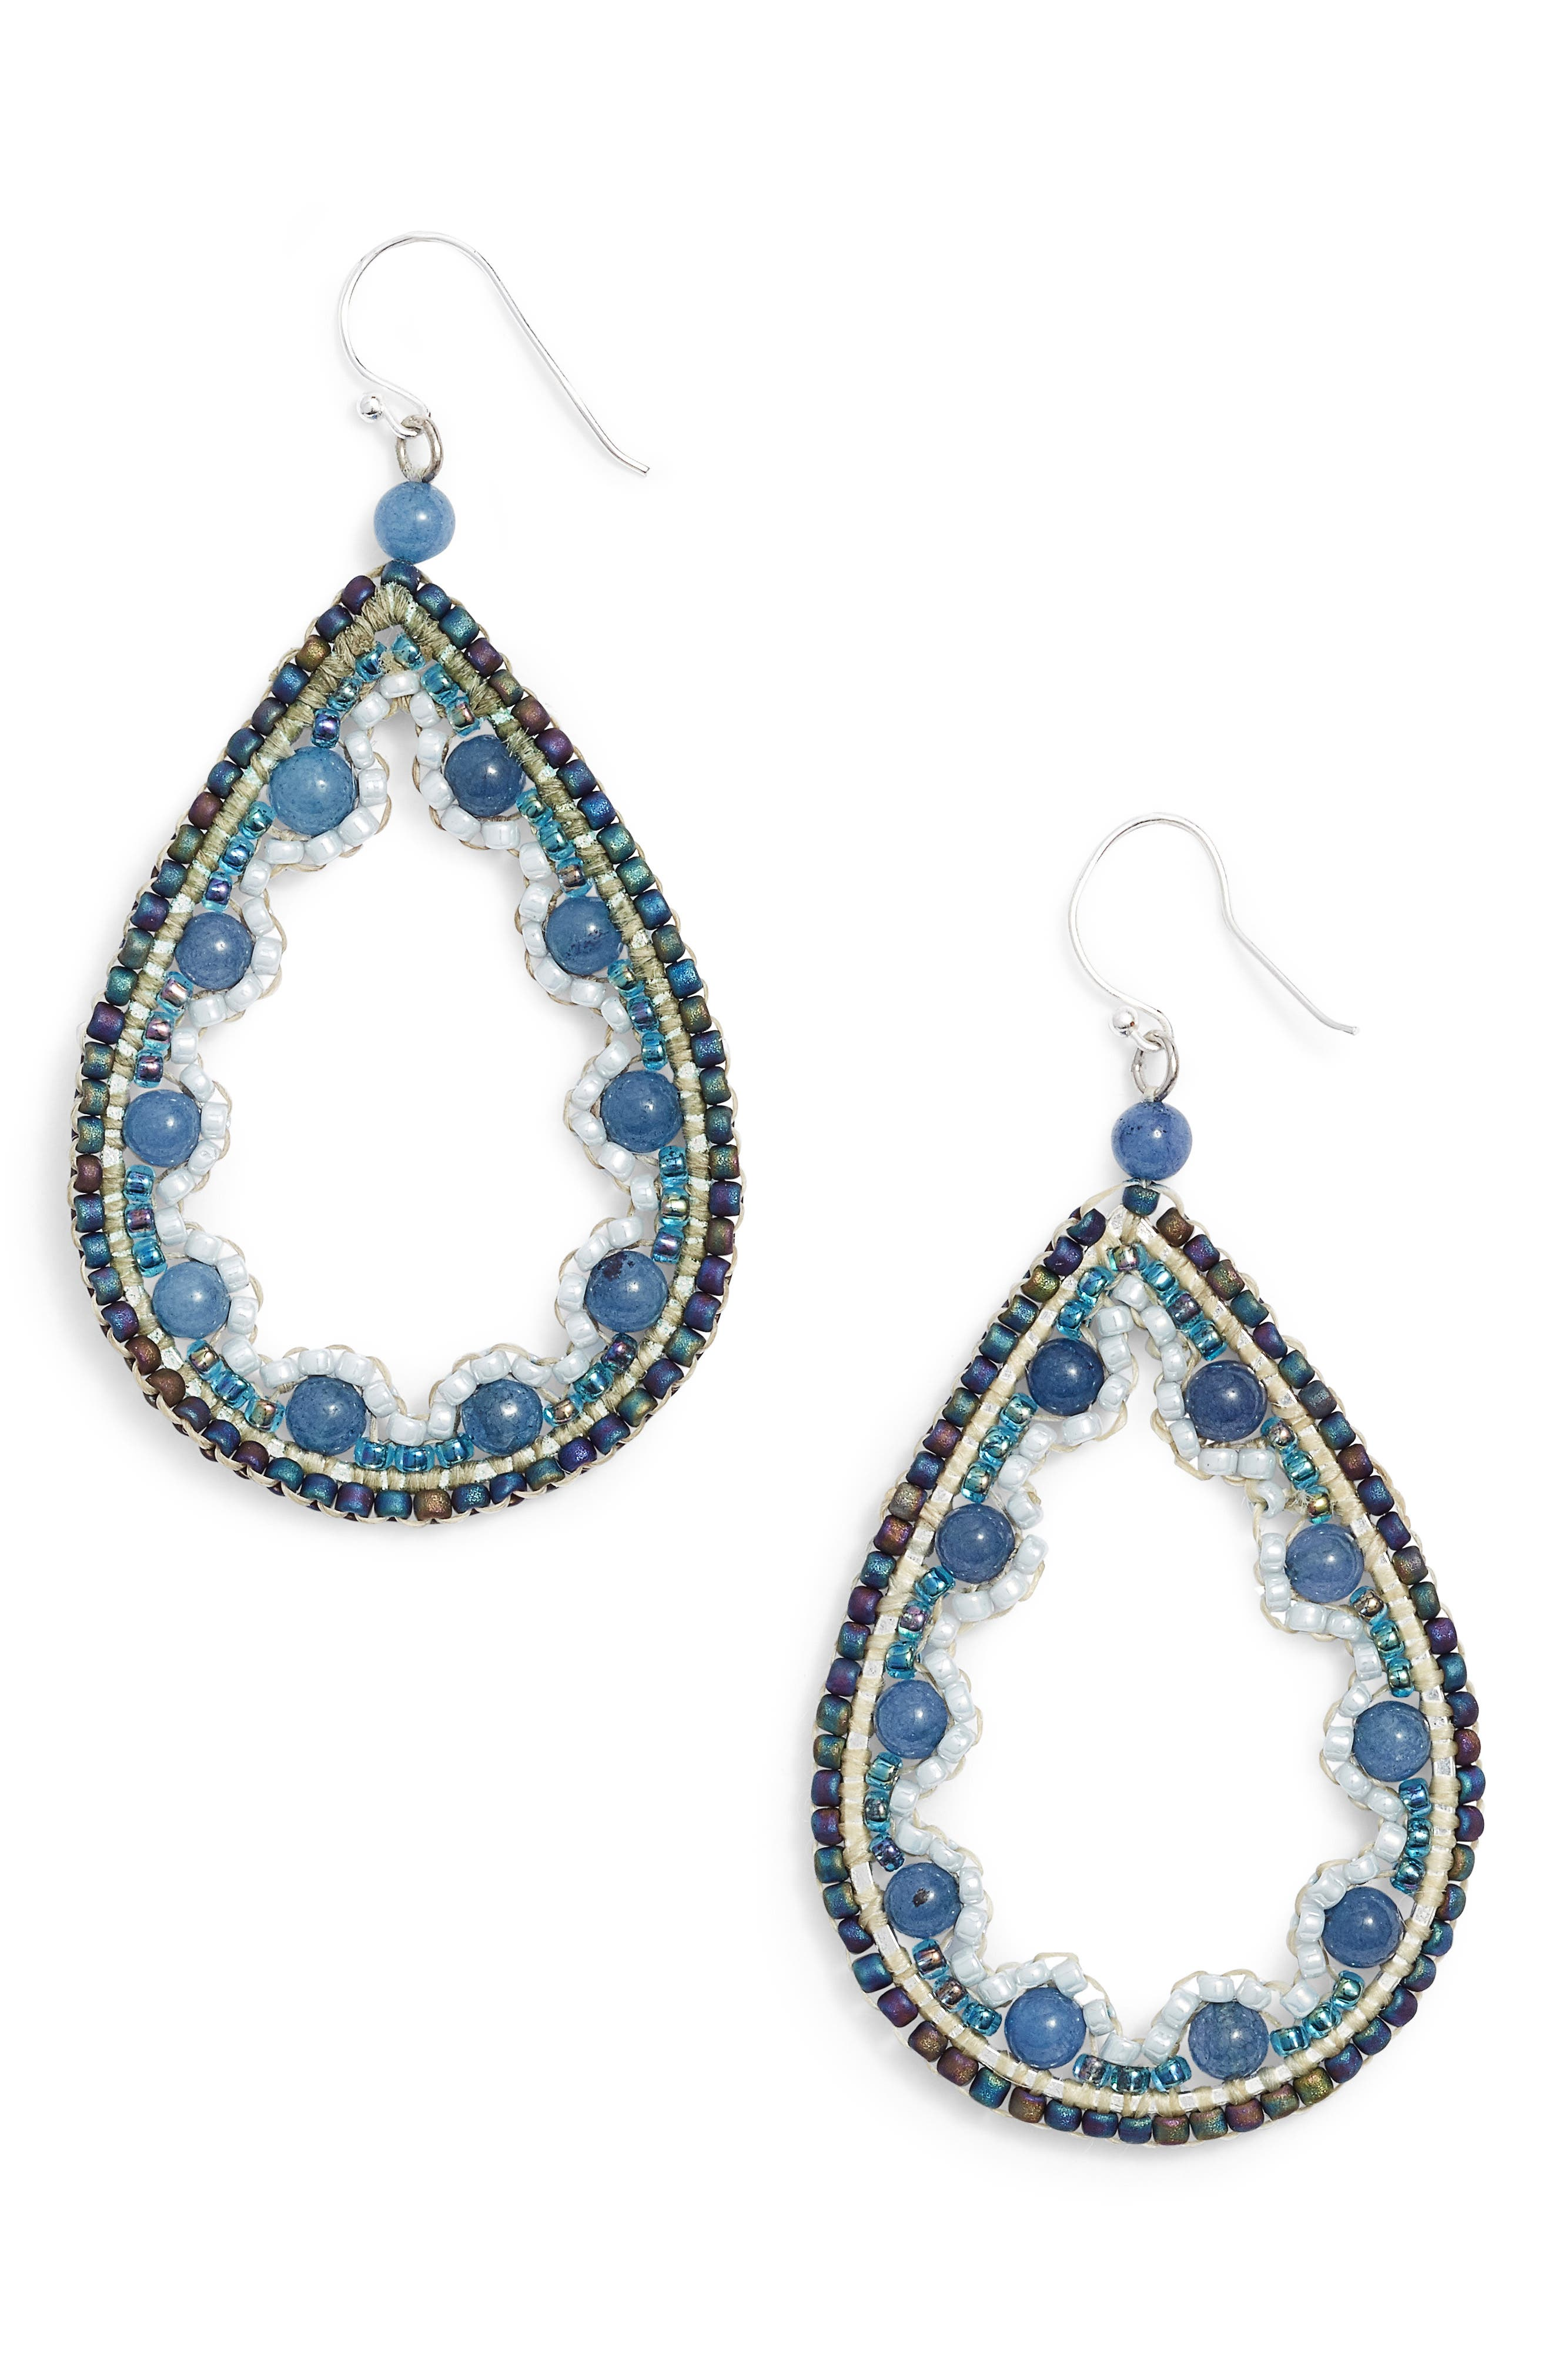 Beaded Agate Teardrop Earrings,                             Main thumbnail 1, color,                             Blue